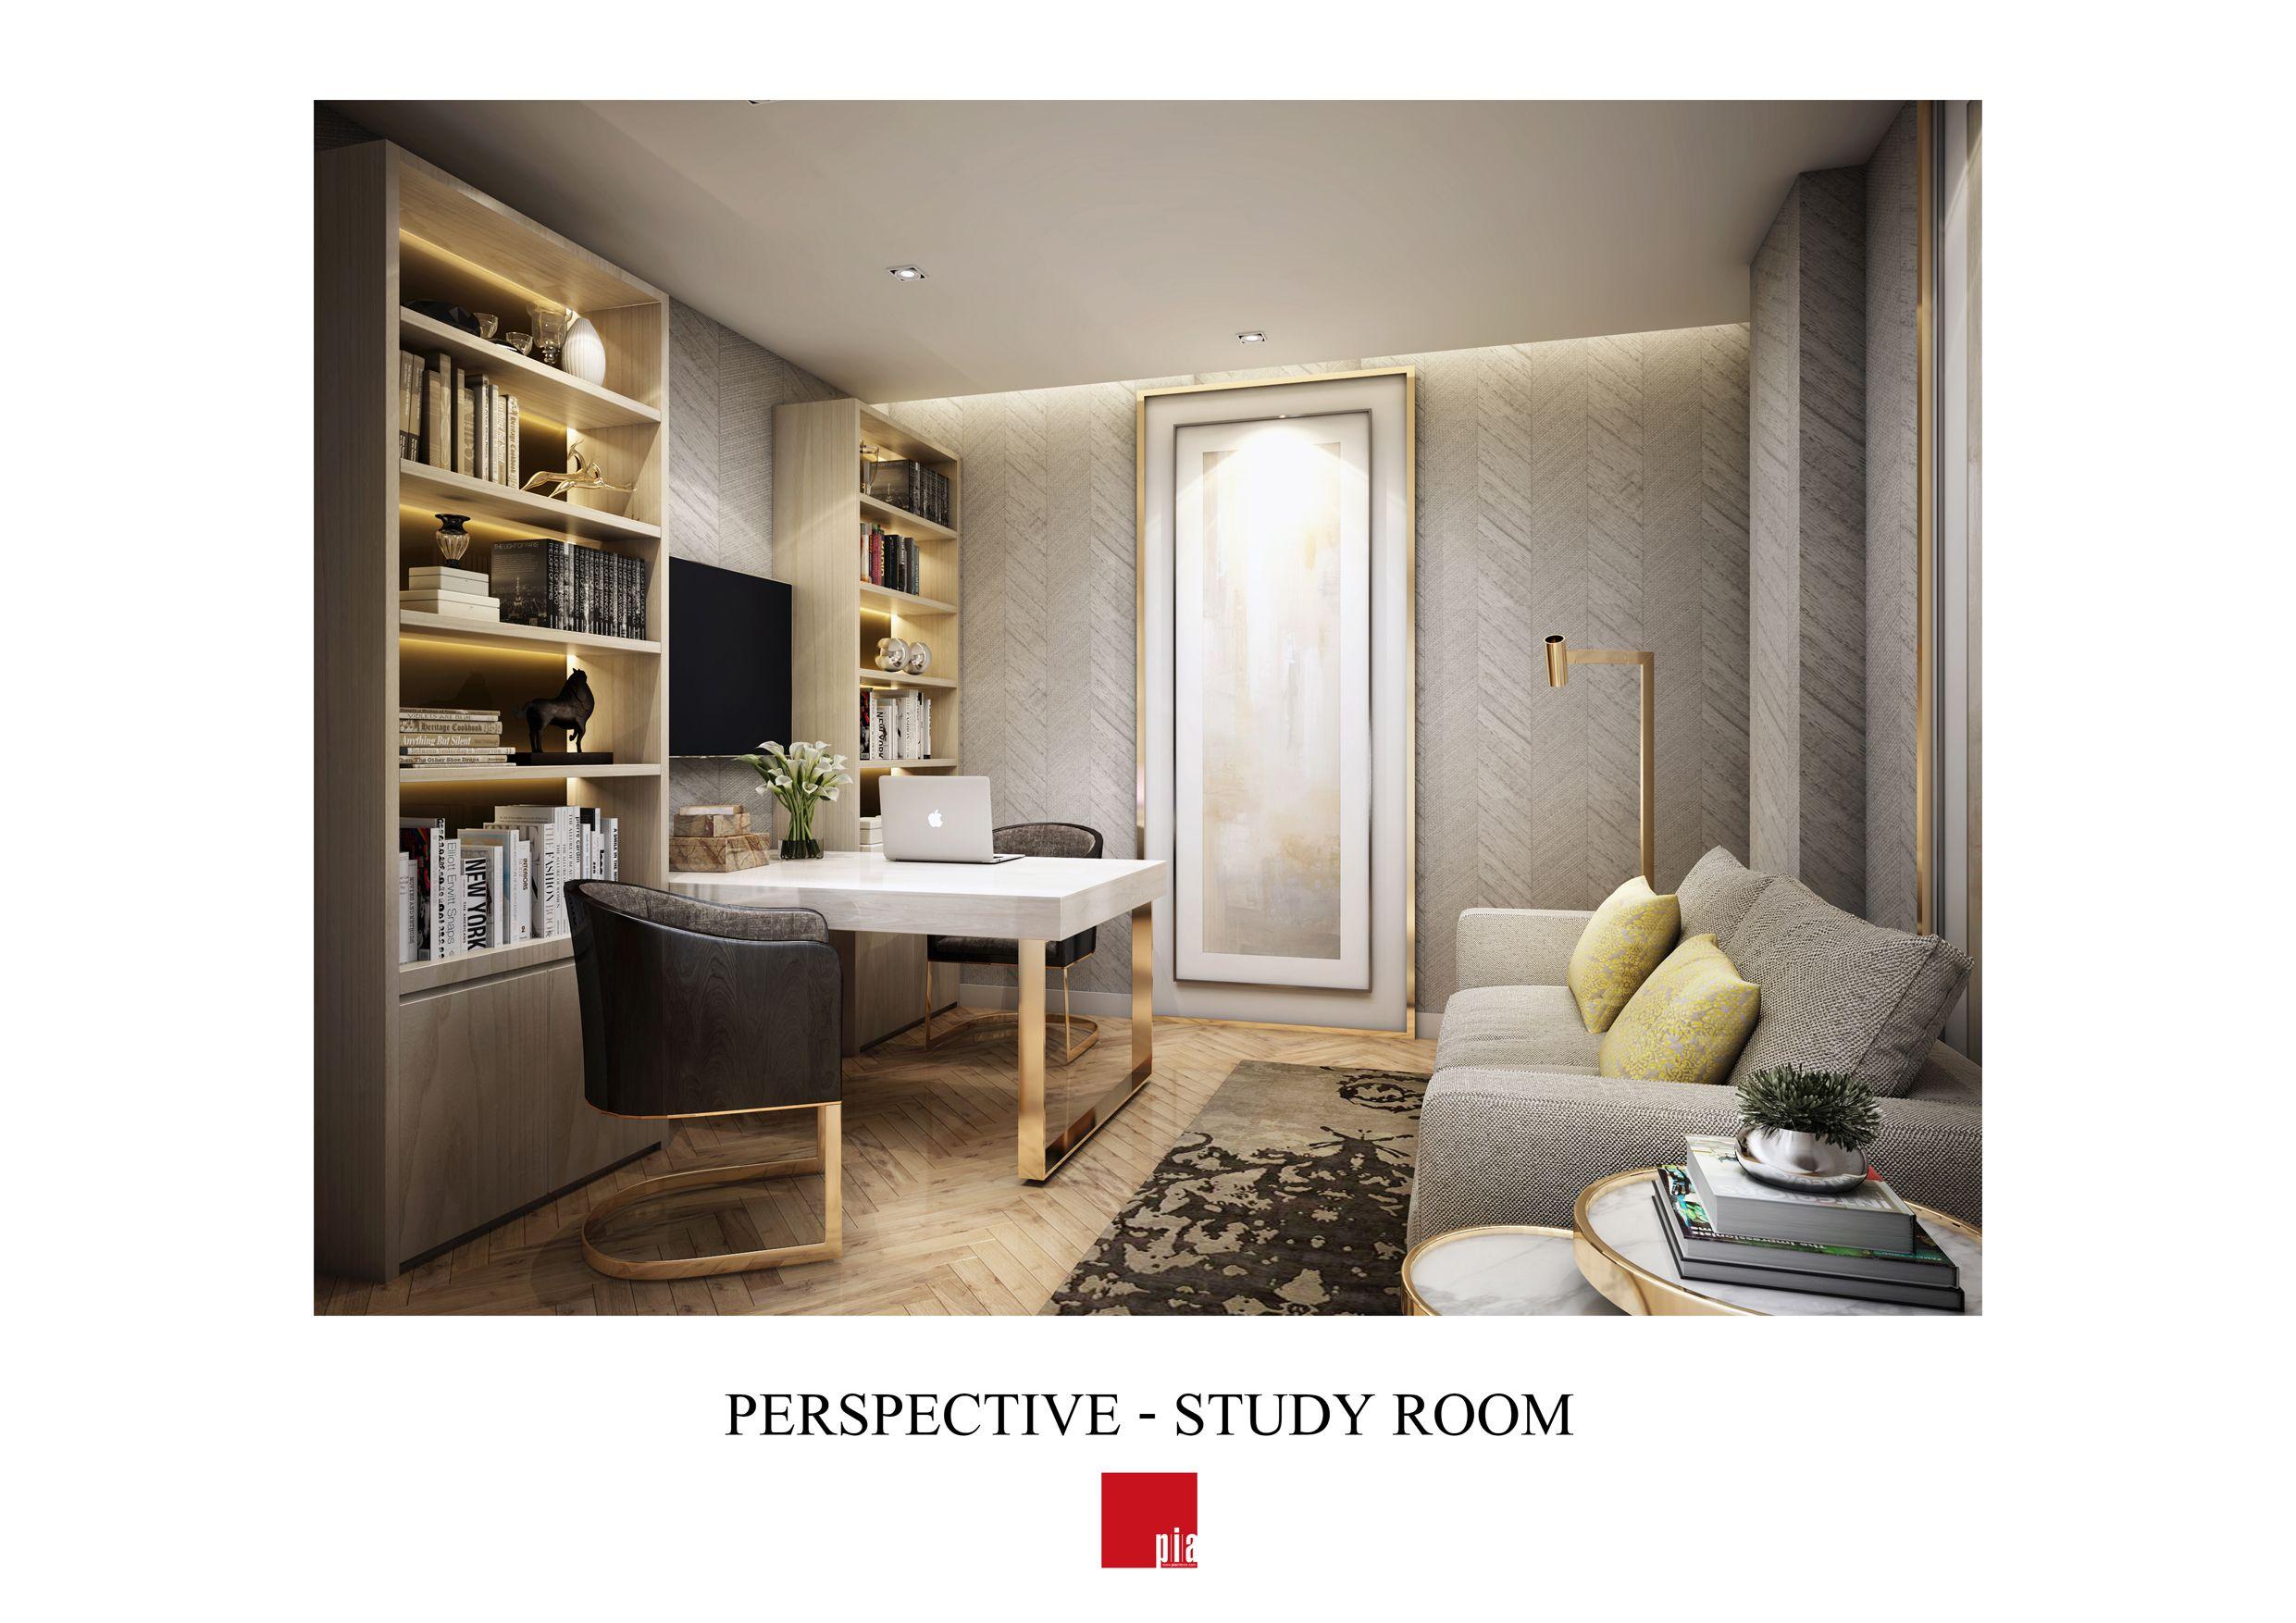 perspective-study-room